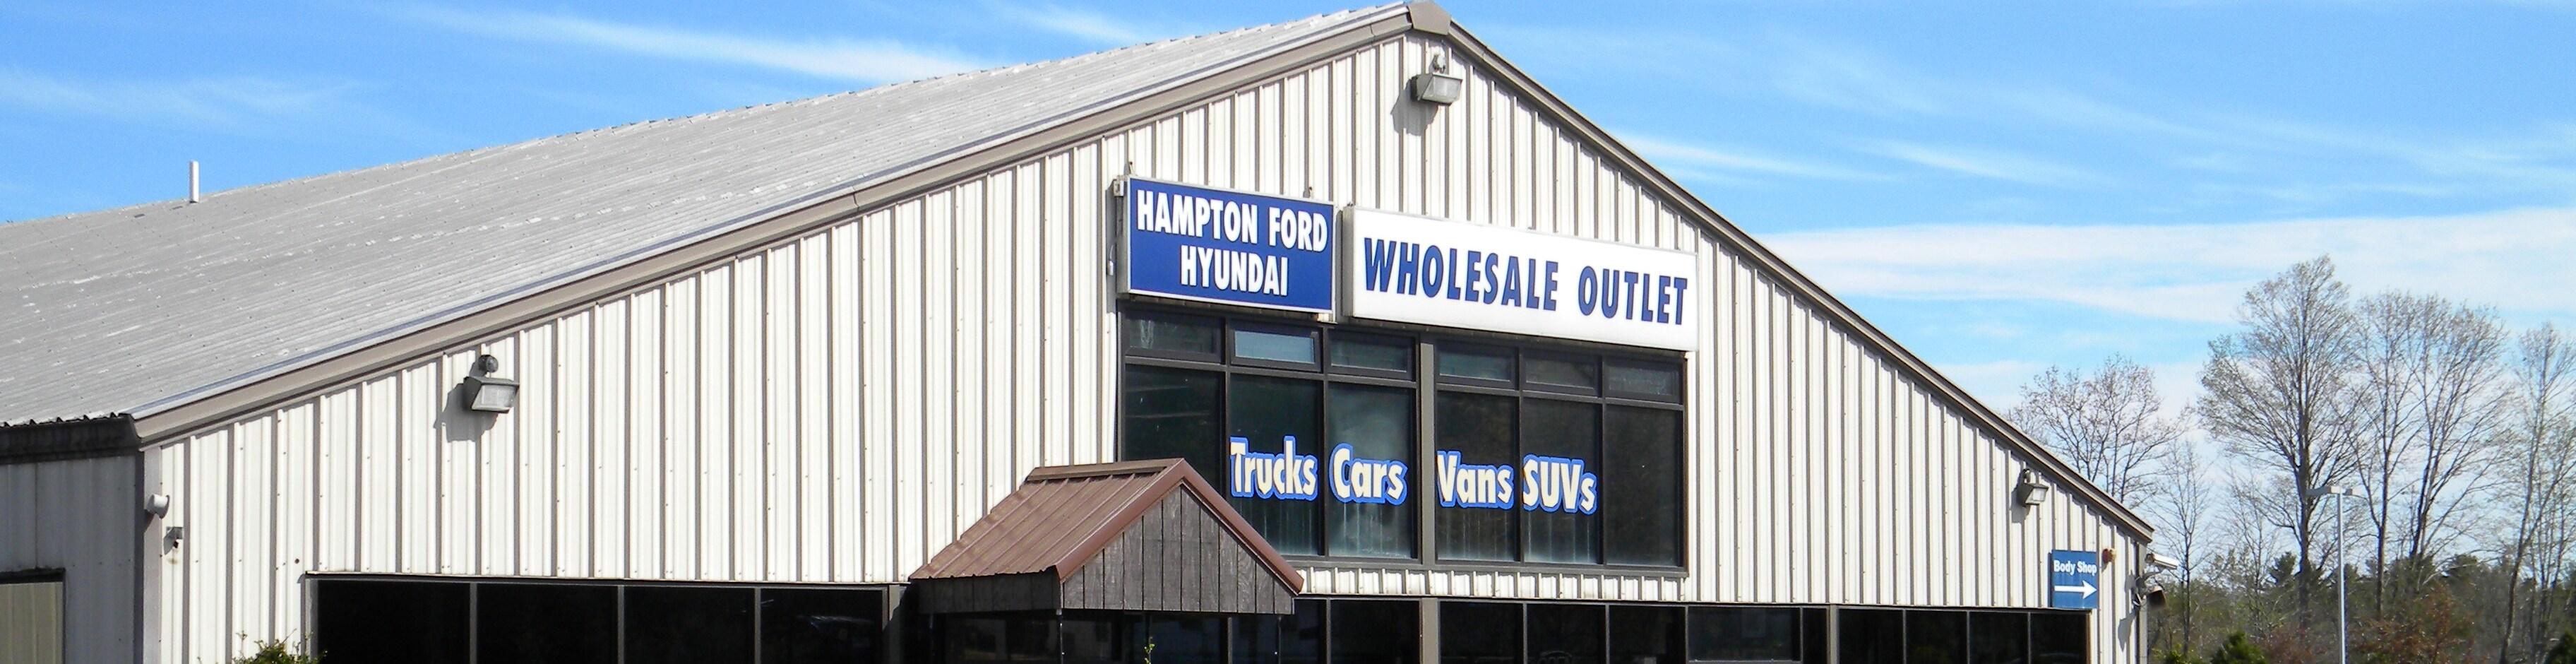 Hampton Ford Vehicles For Sale In North Hampton Nh 03862